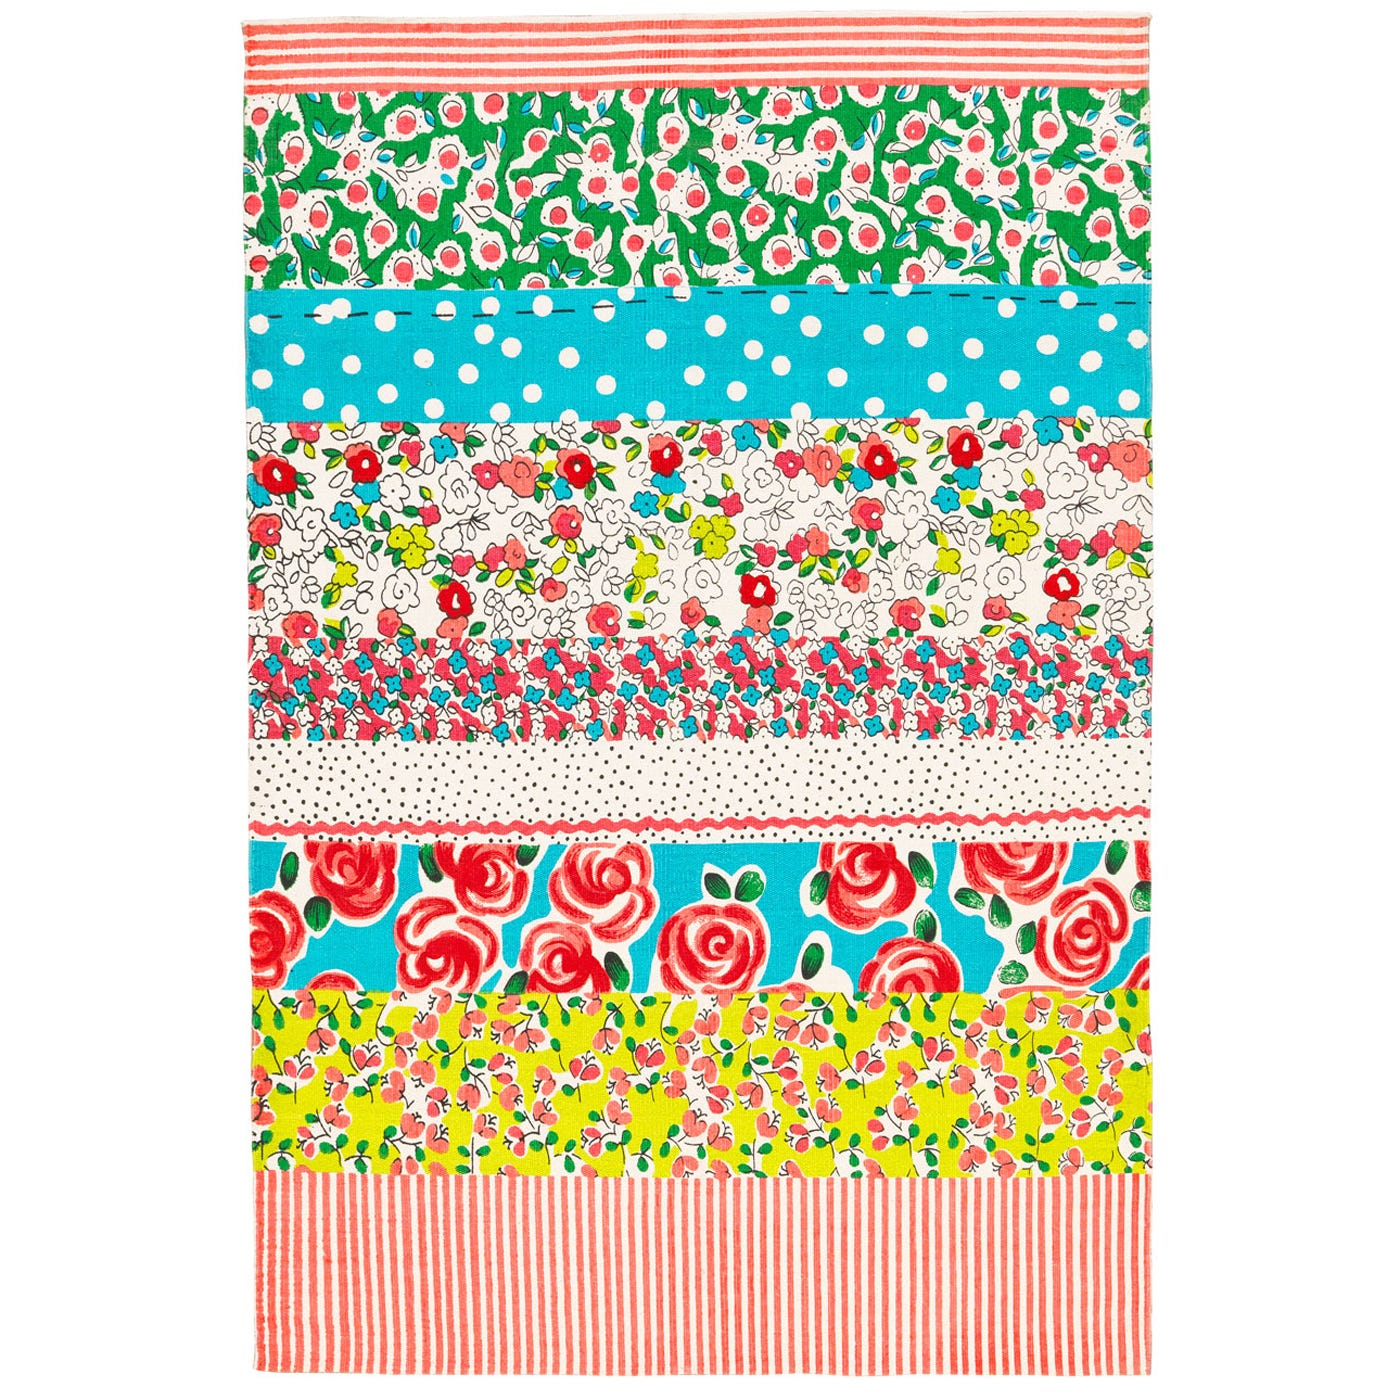 Designers Guild Daisy Stripe Peony Rug